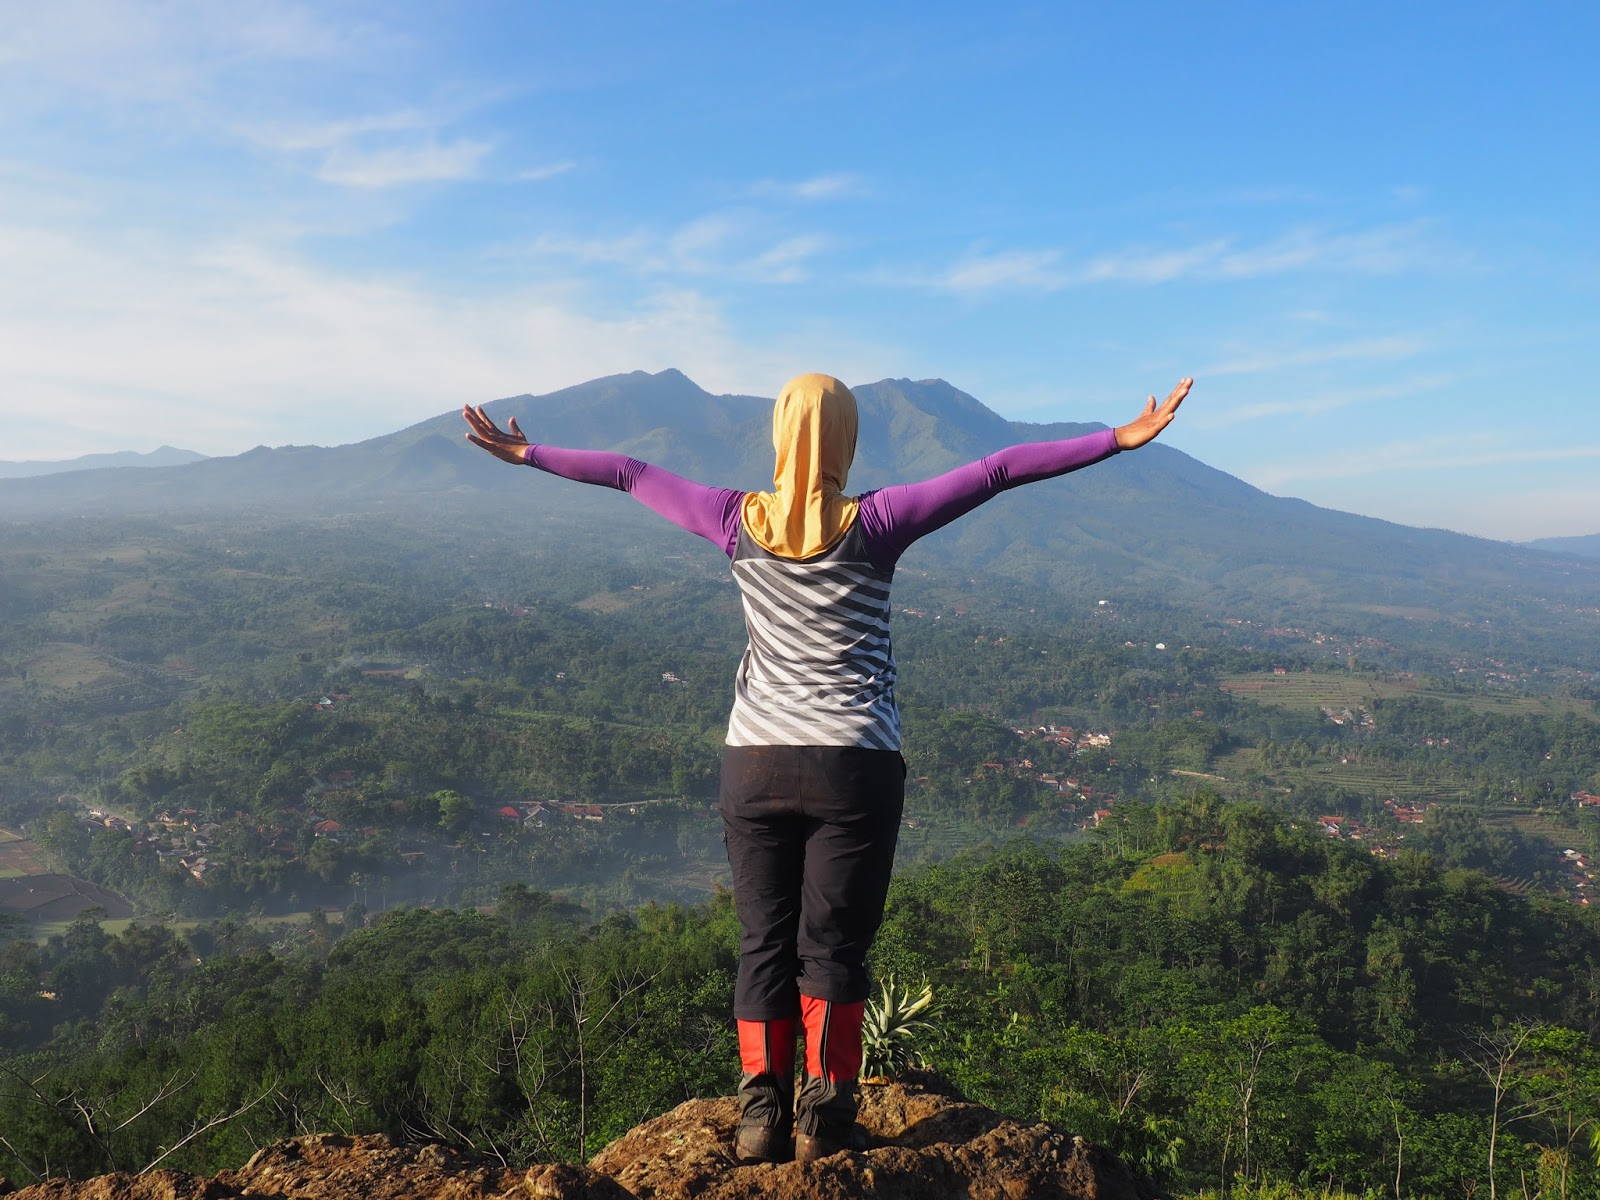 Coretan Jelajah Dot Bandung Selatan View Pegunungan Malabar Kebun Teh